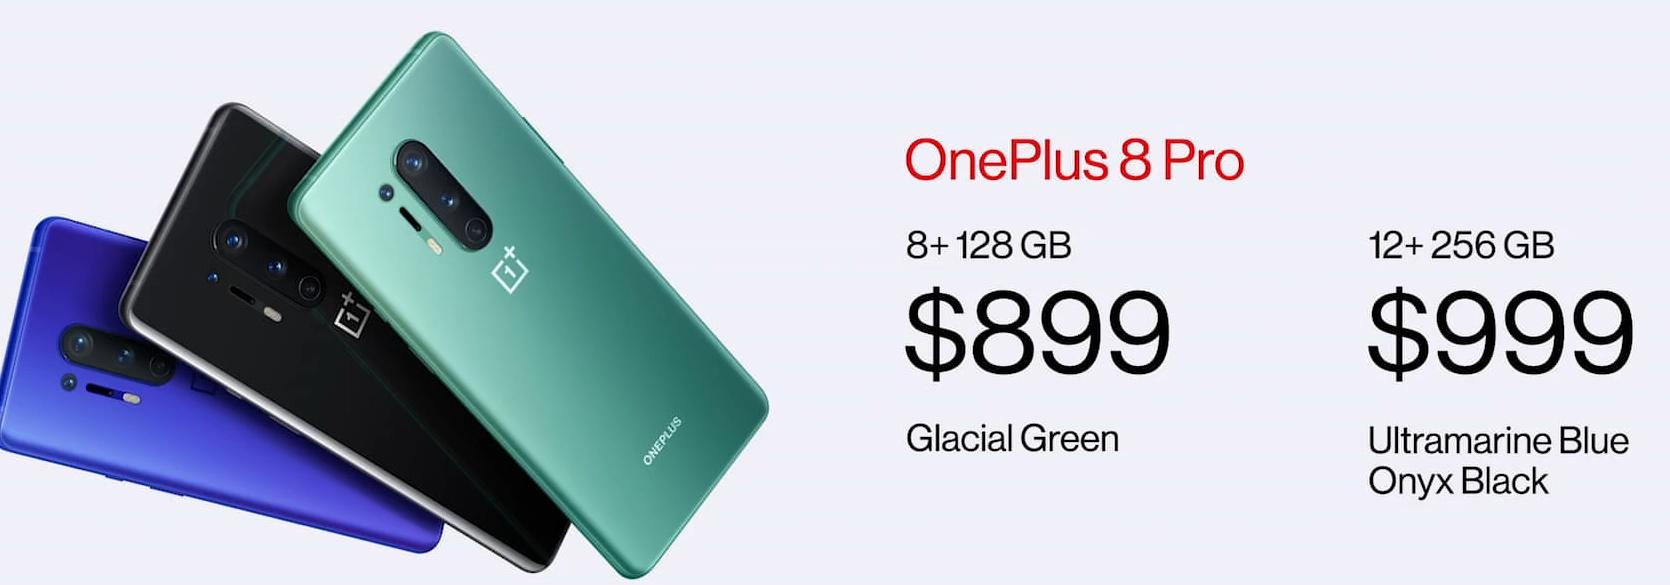 OnePlus 8 Pro - Price